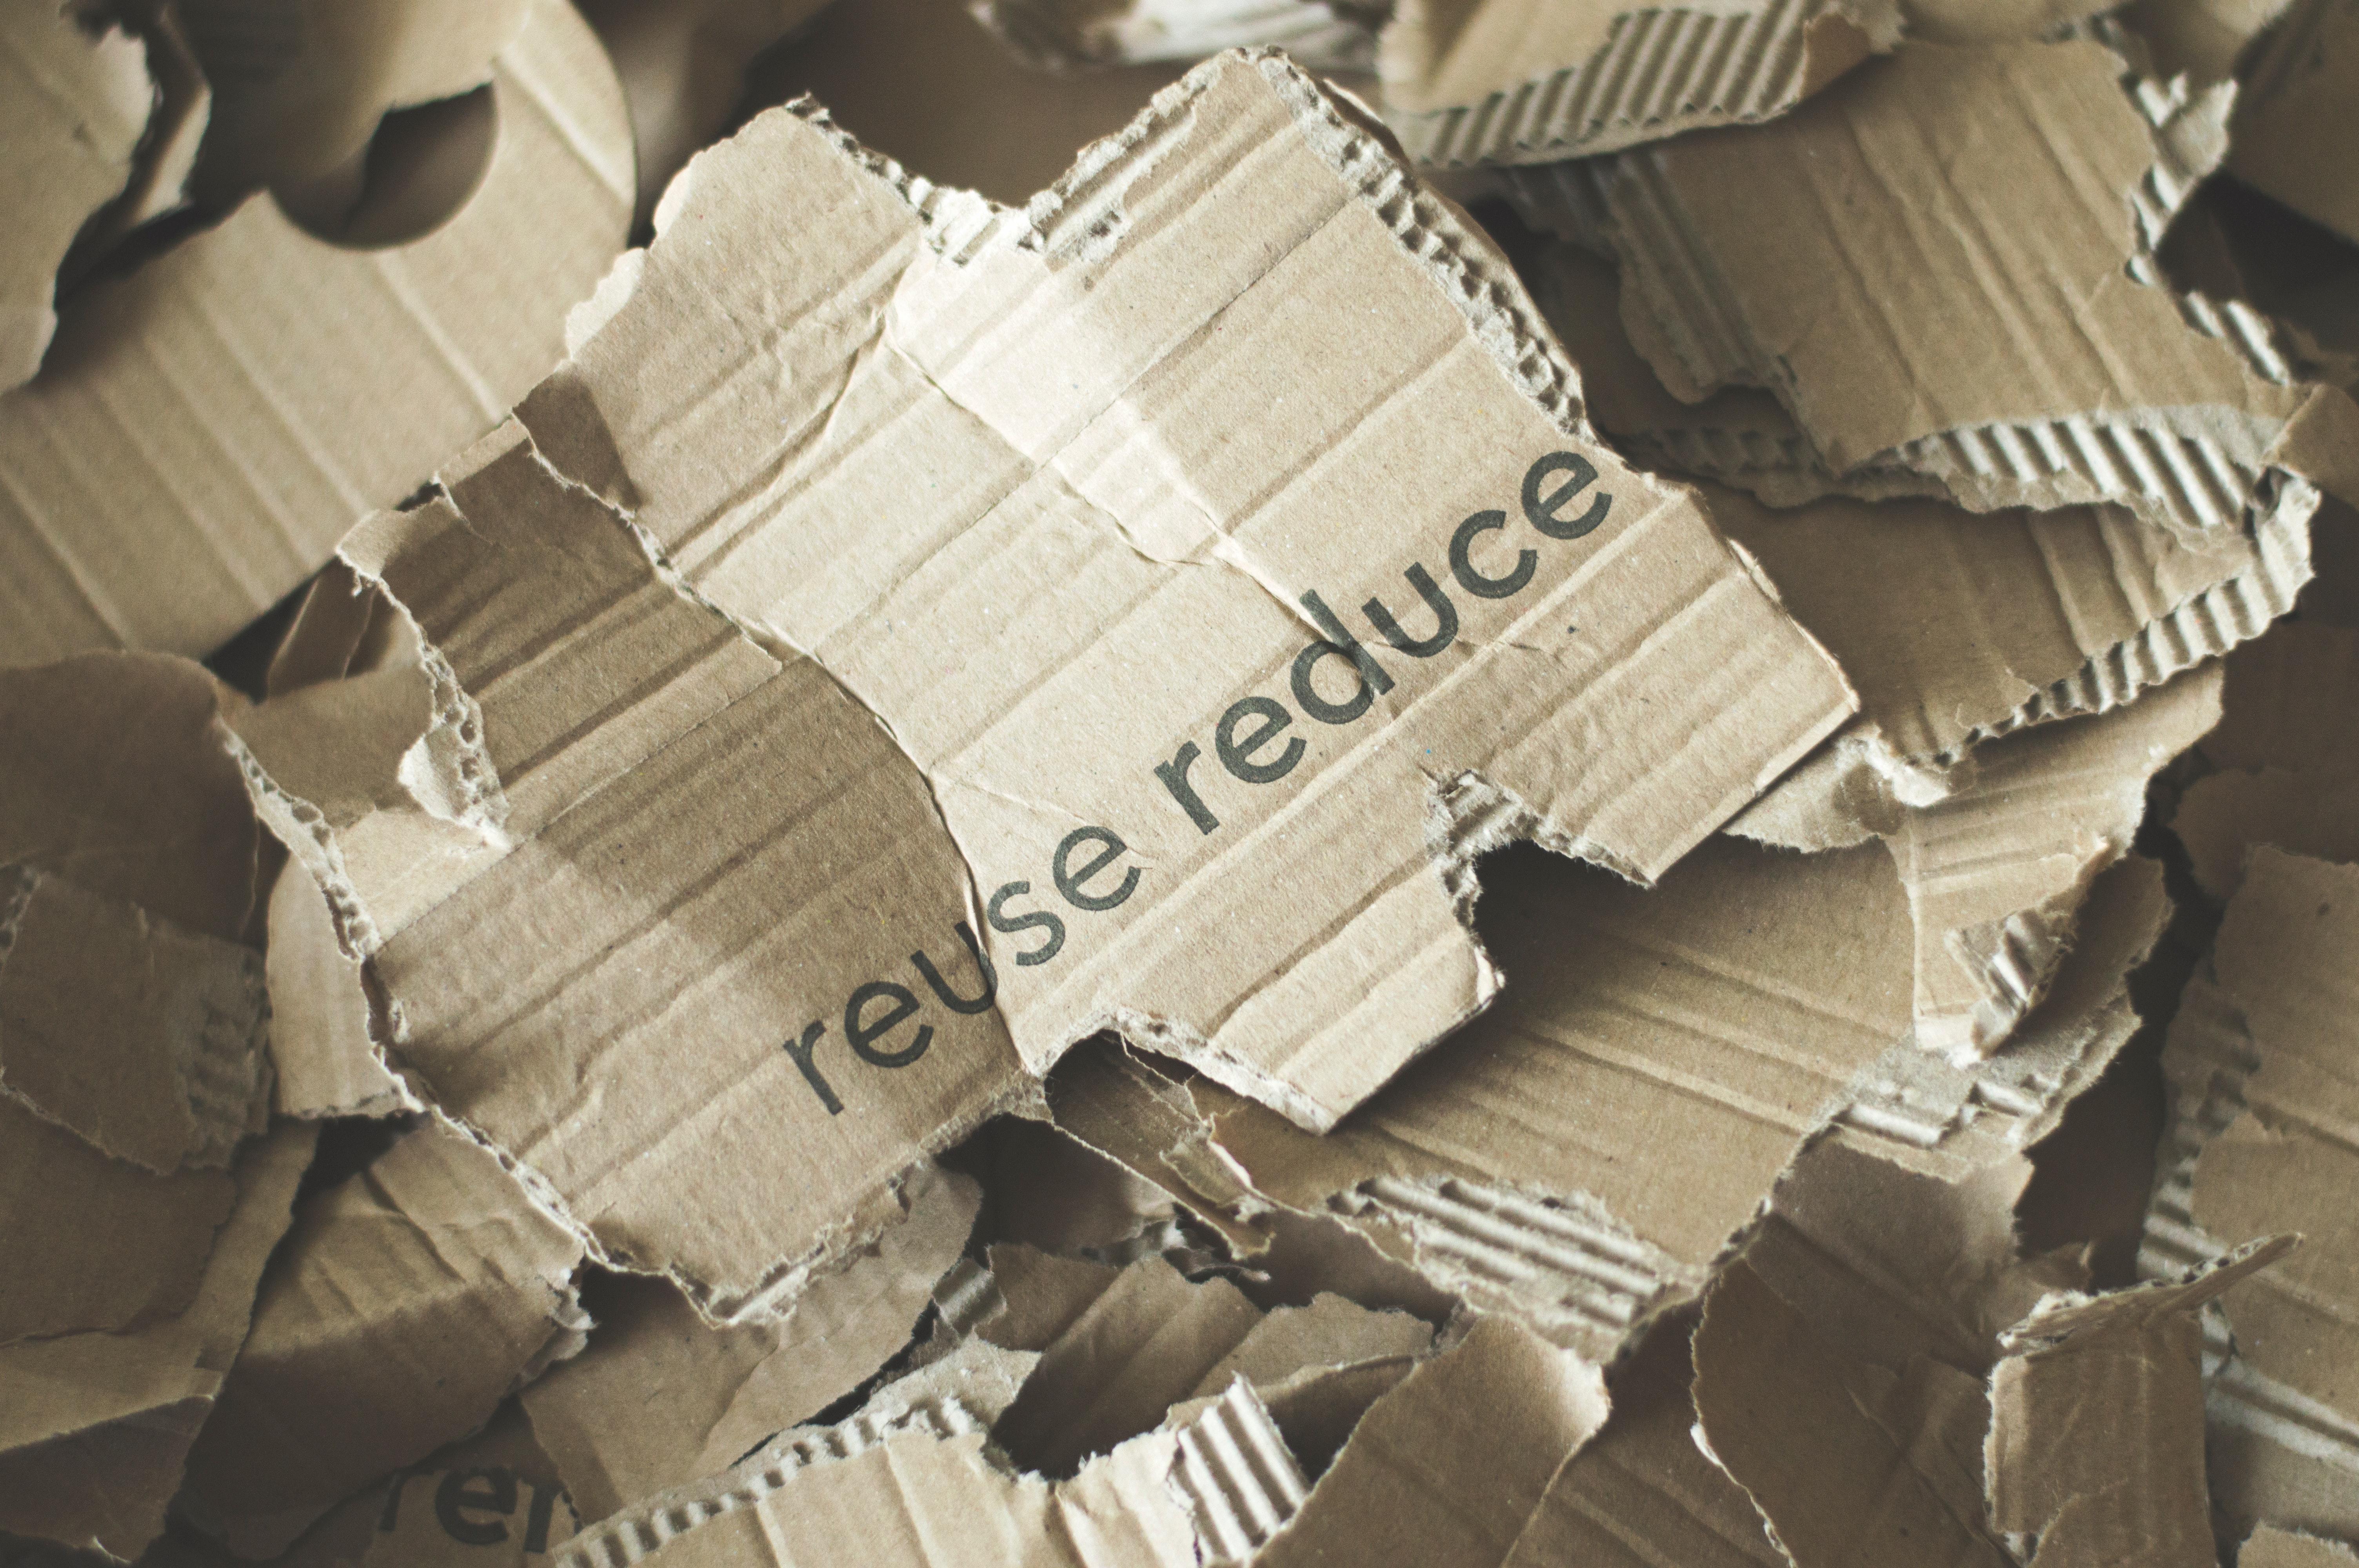 Trucos para Reciclar/Reutilizar